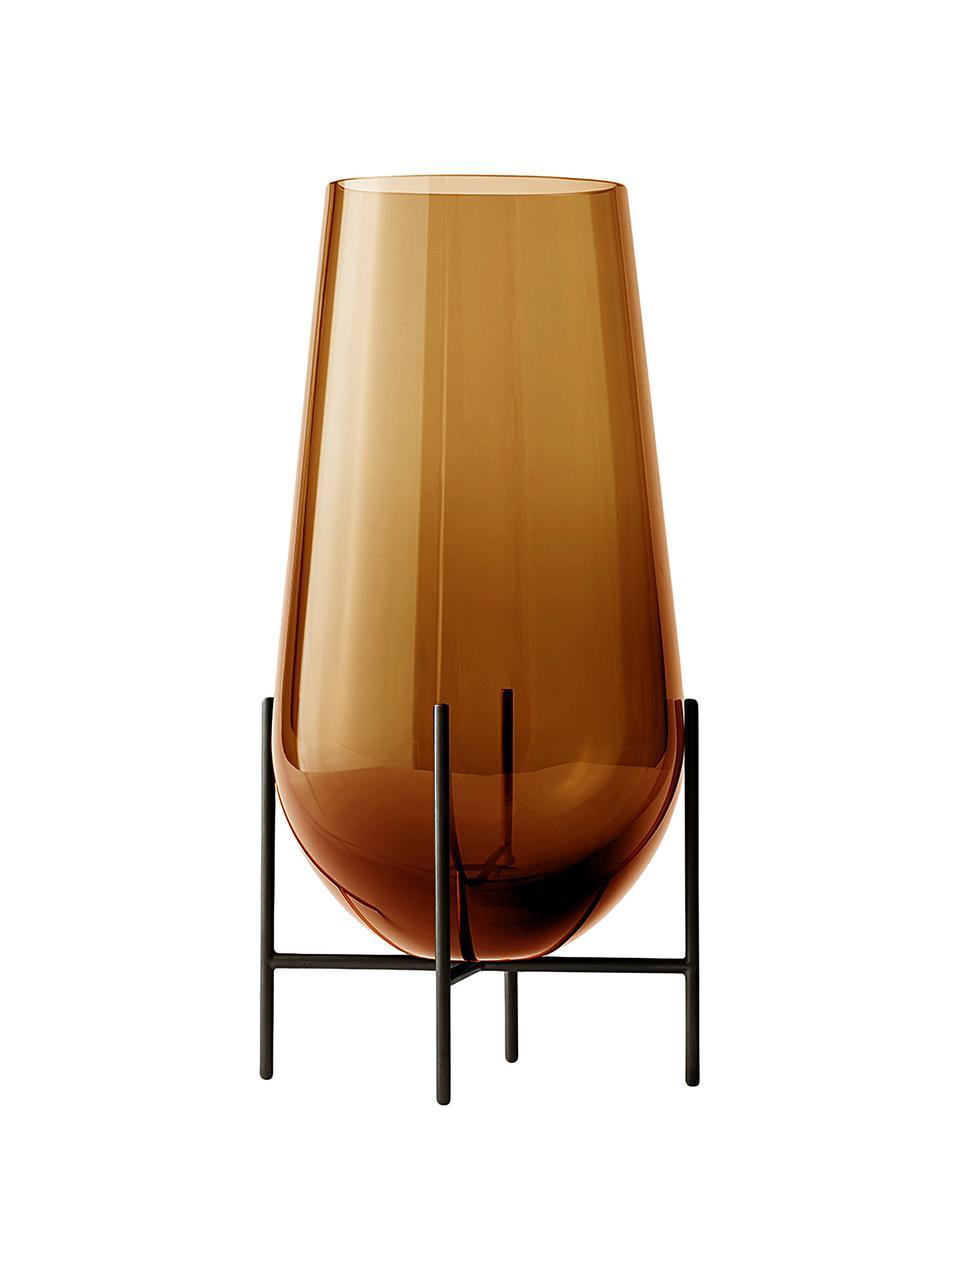 Mundgeblasene Bodenvase Échasse, Gestell: Messing, Vase: Glas, mundgeblasen, Braun, Bronze, Ø 30 x H 60 cm